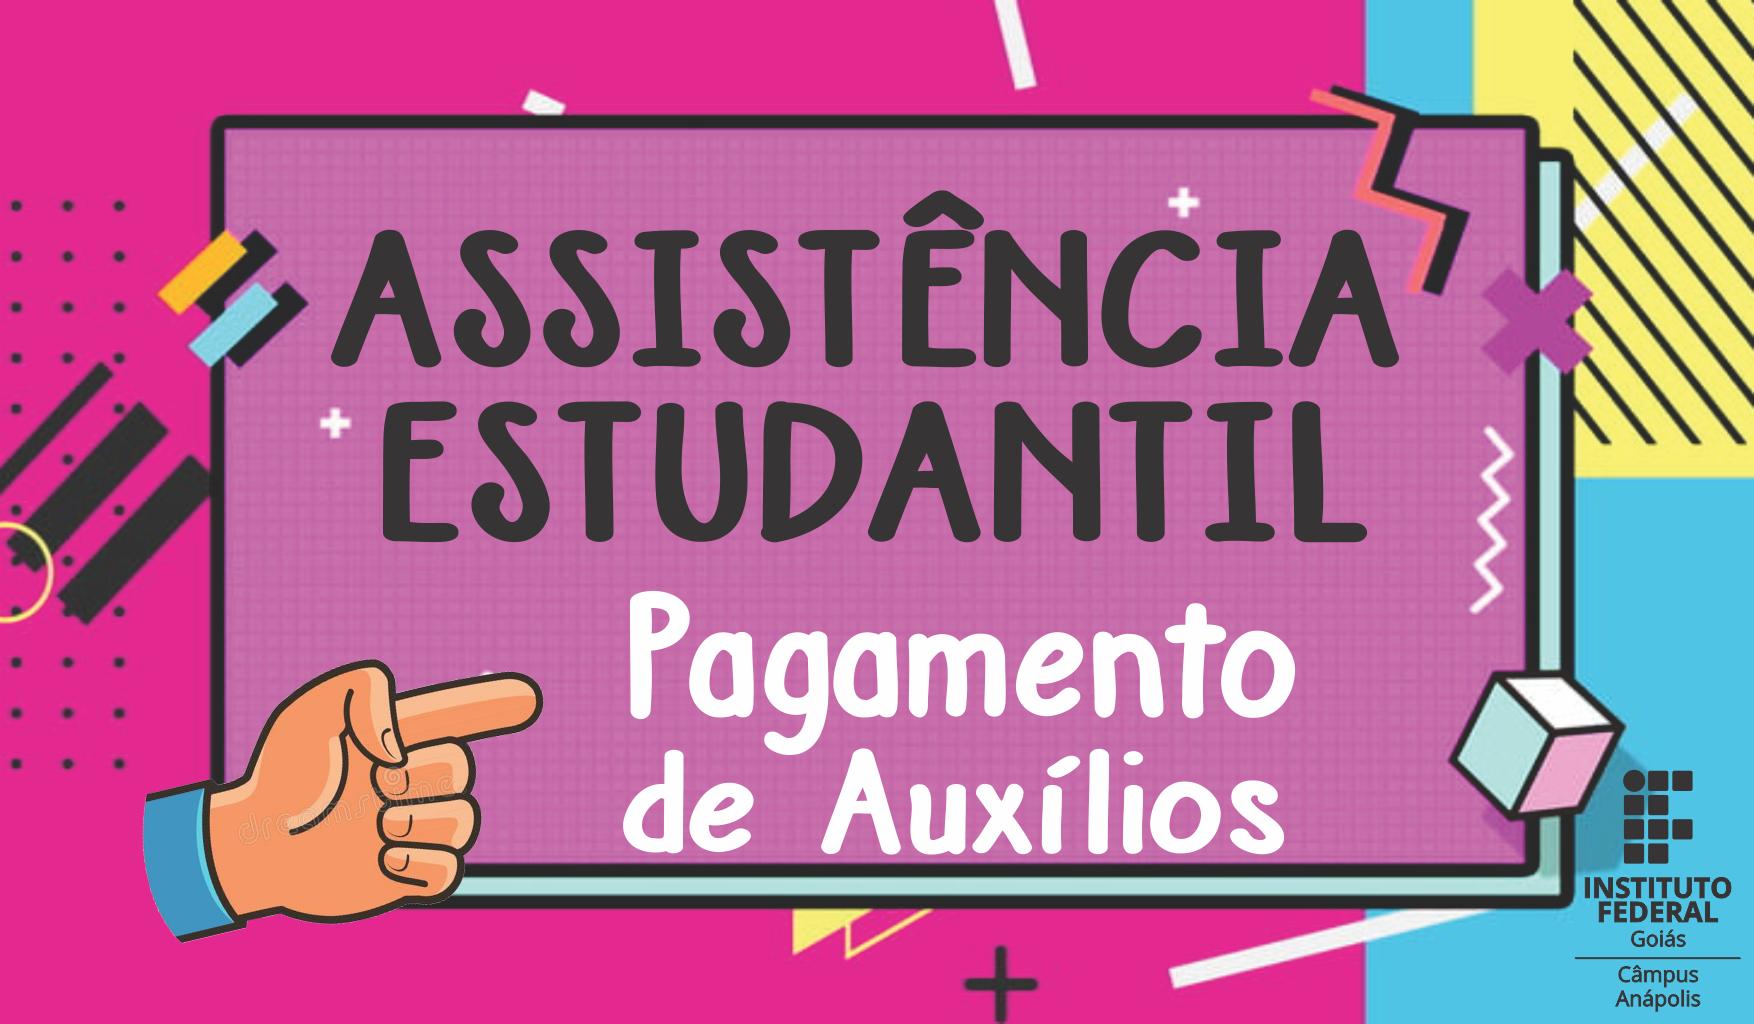 Assistência estudantil - pagamento de auxílios